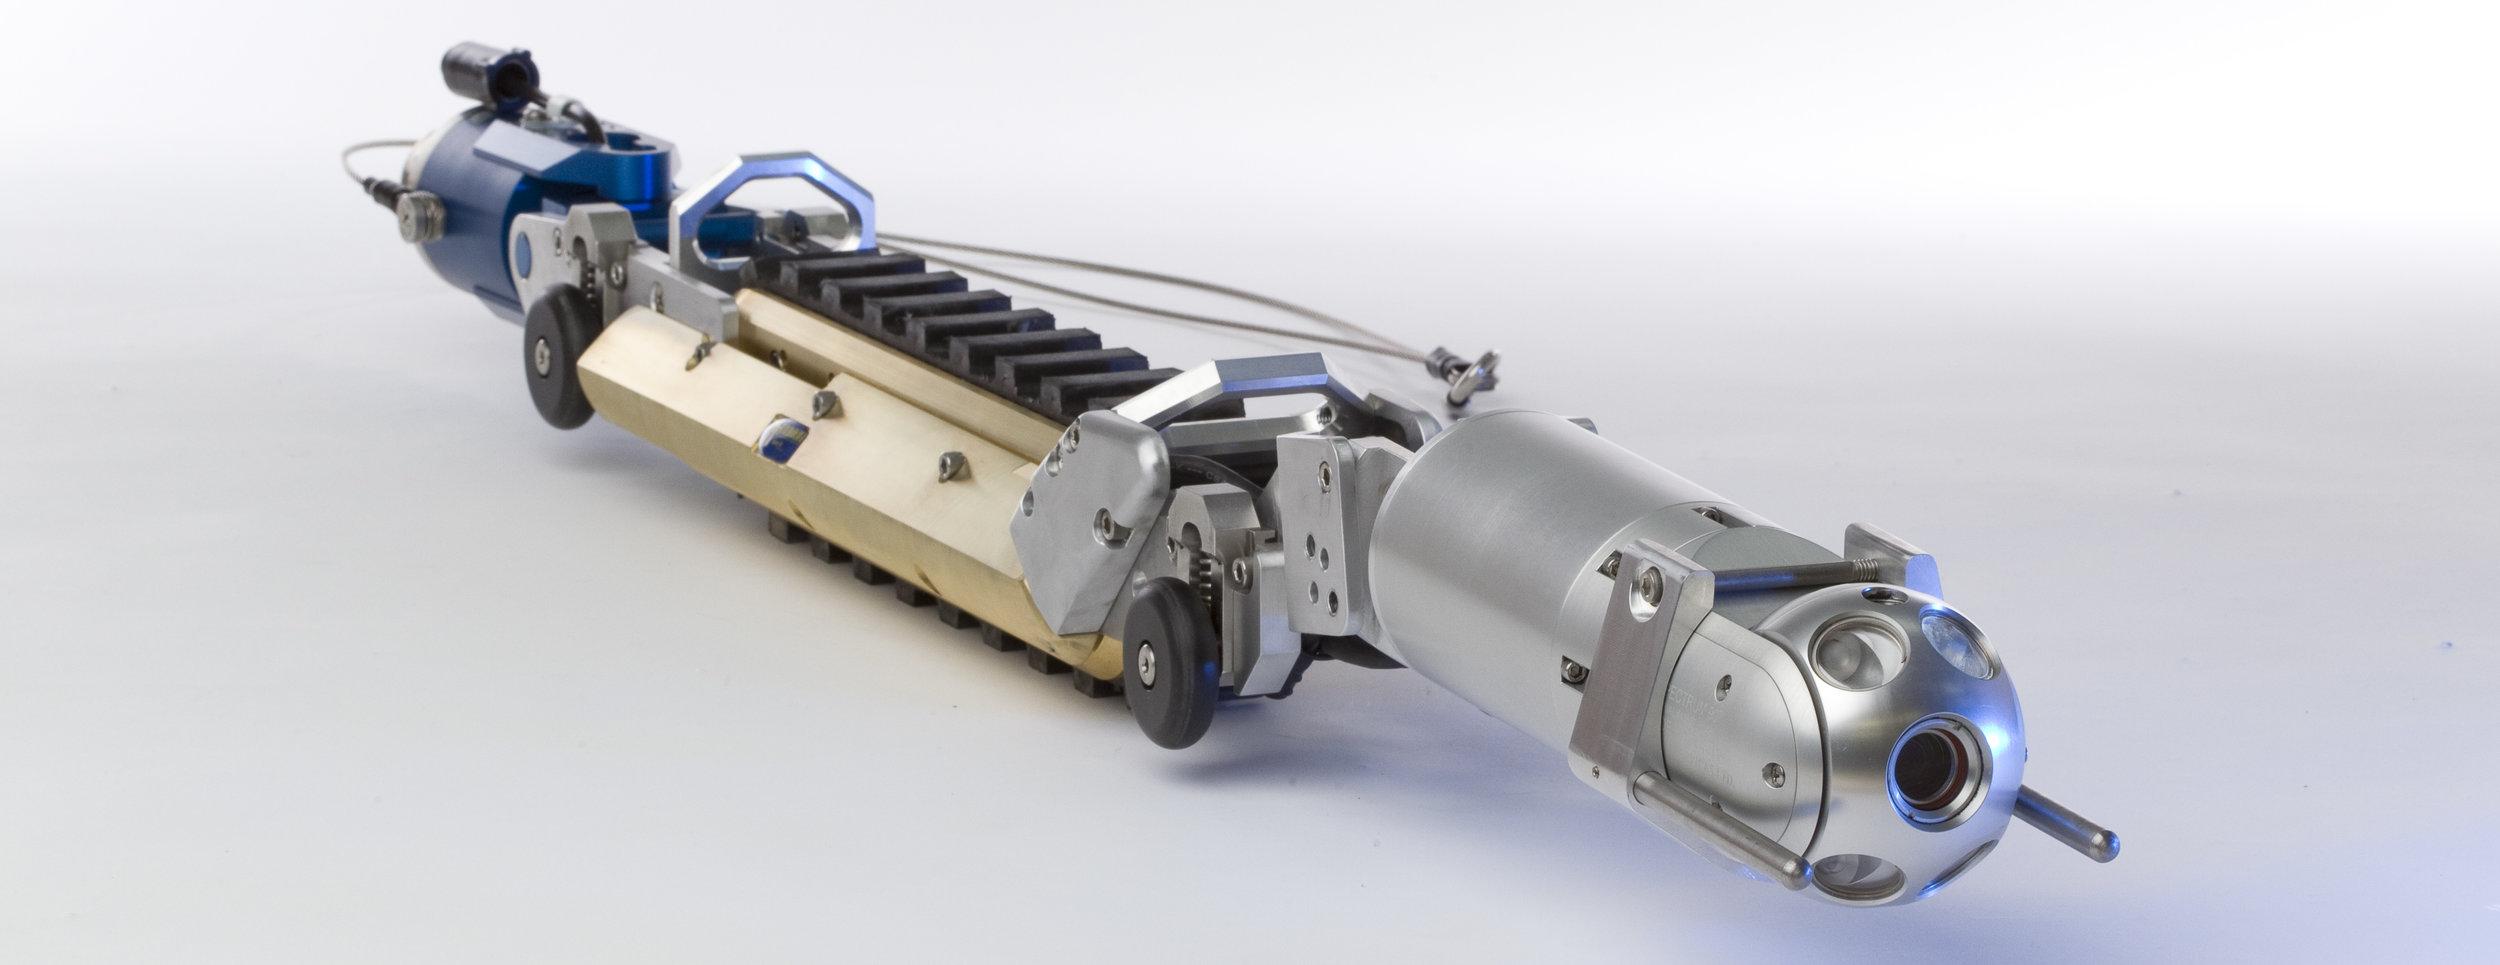 Versatrax 150™ with Traction Enhancement